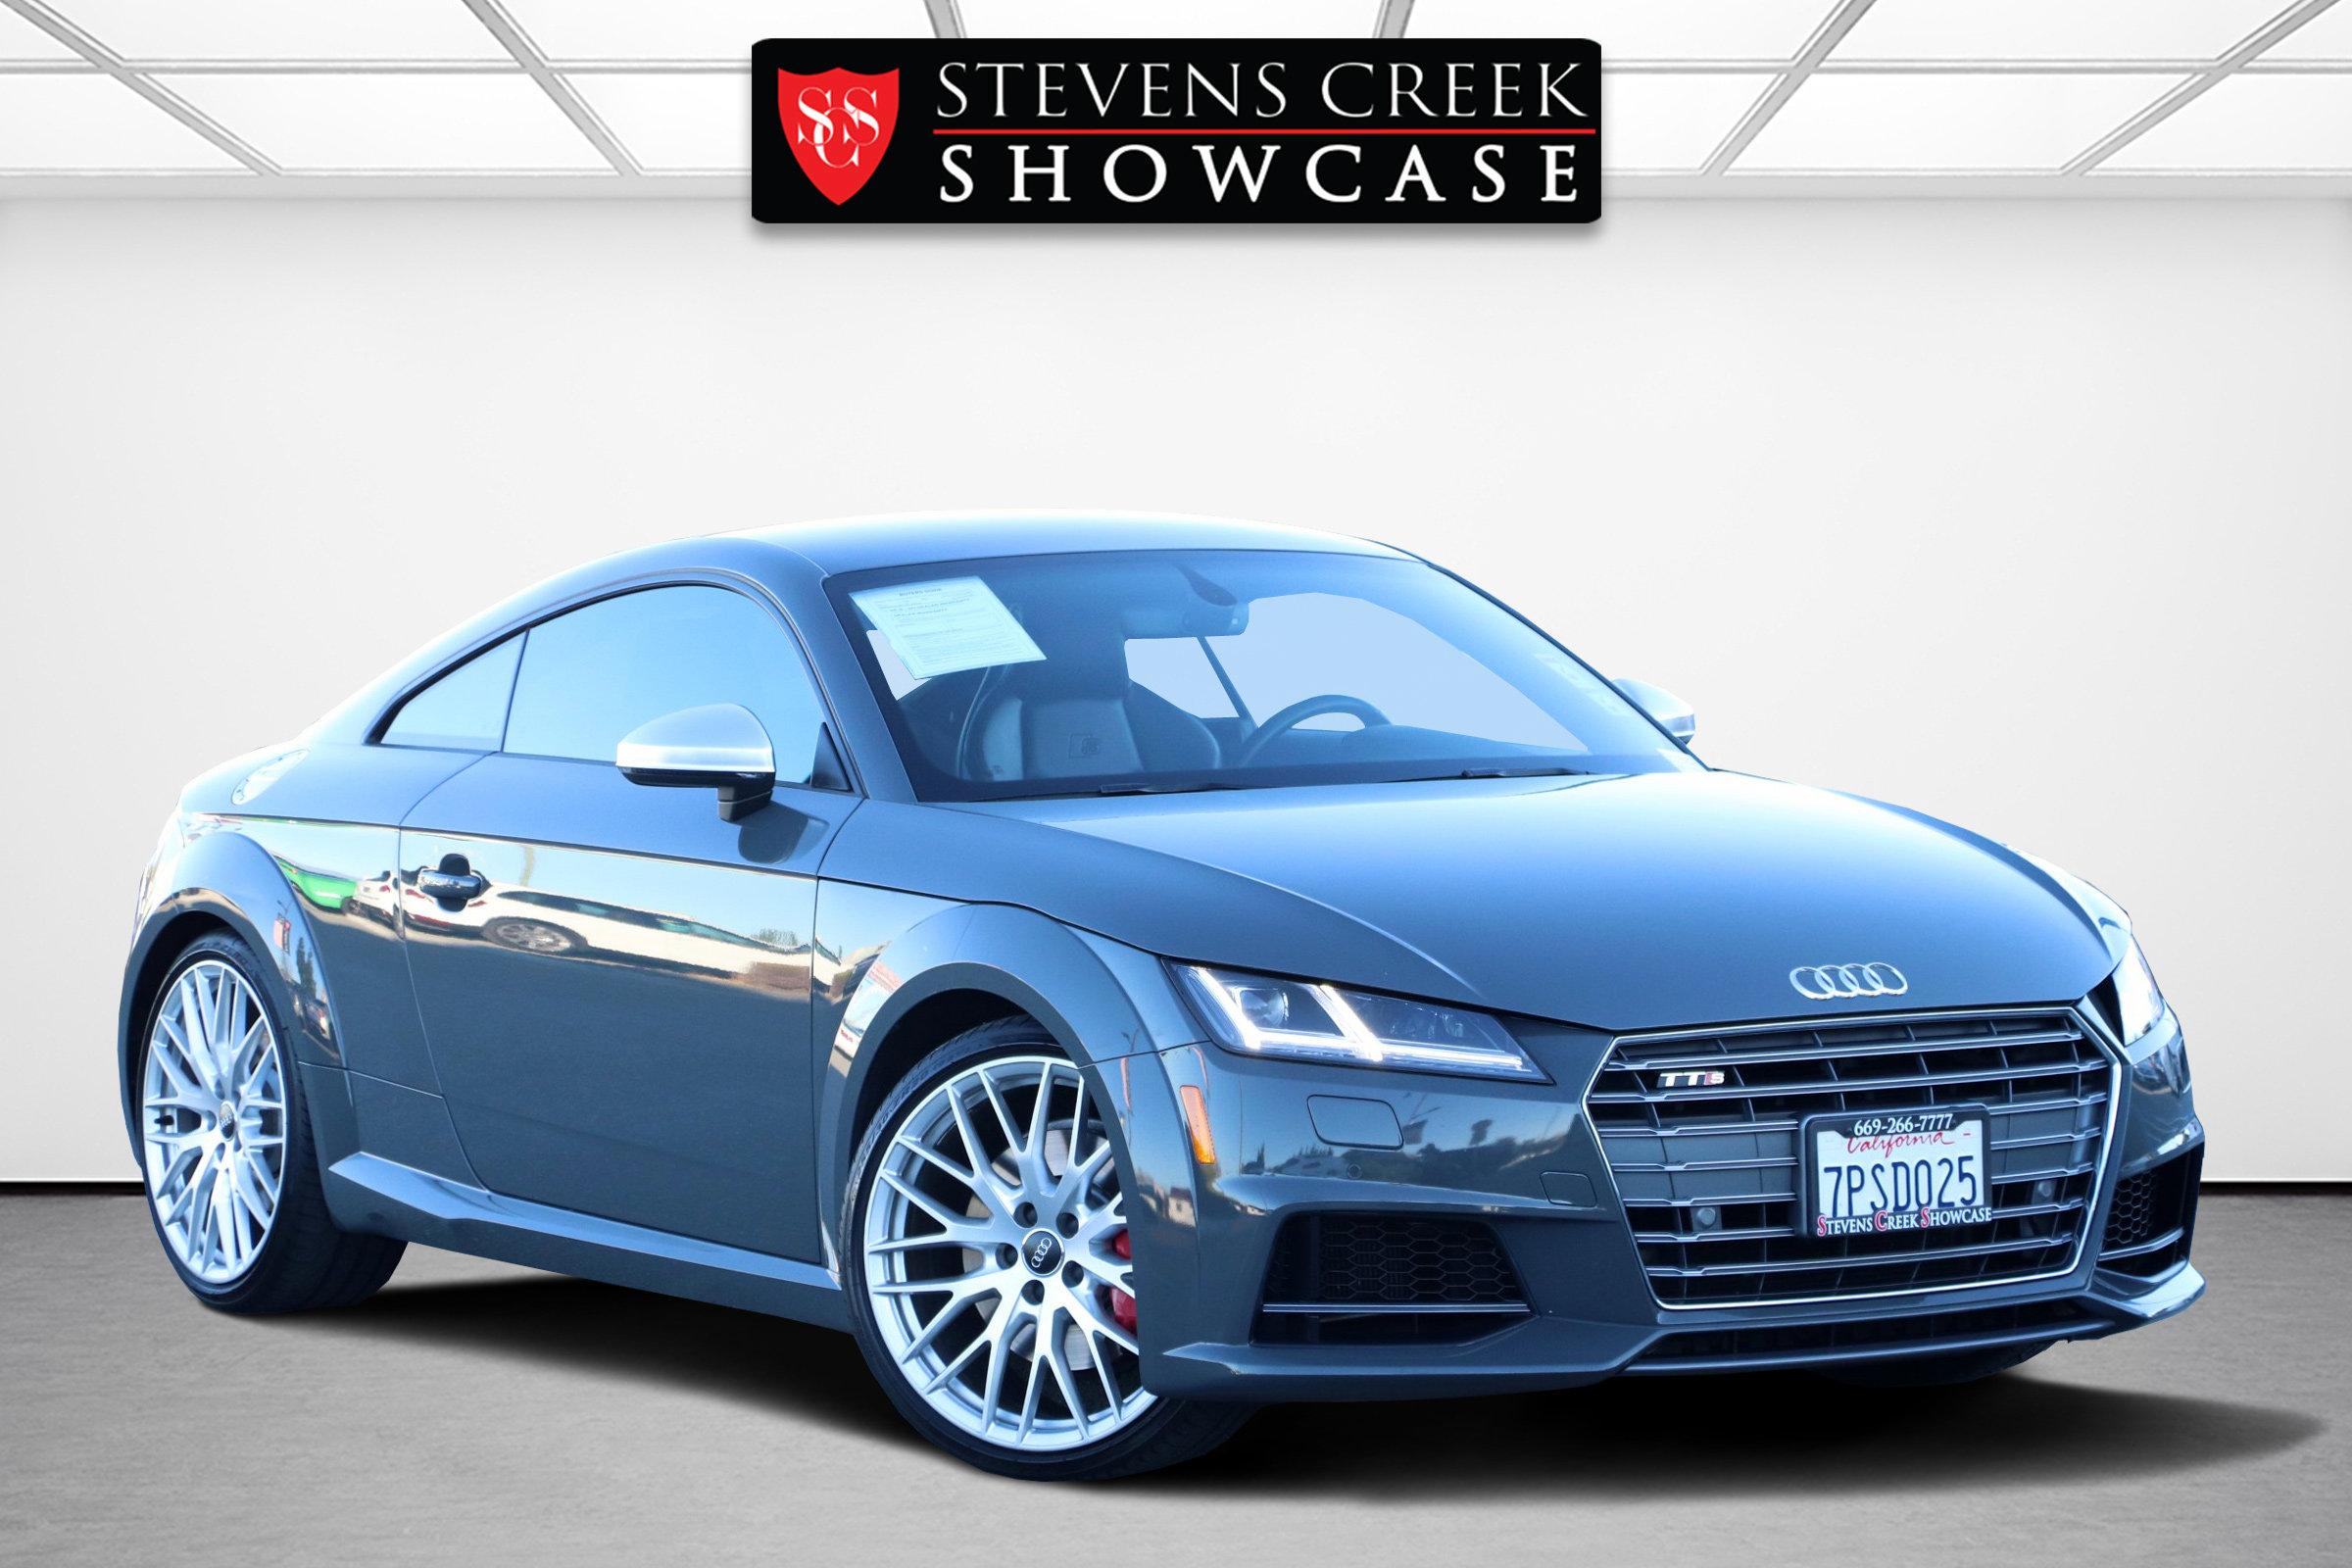 2016 Audi TTS 2.0T Coupe image